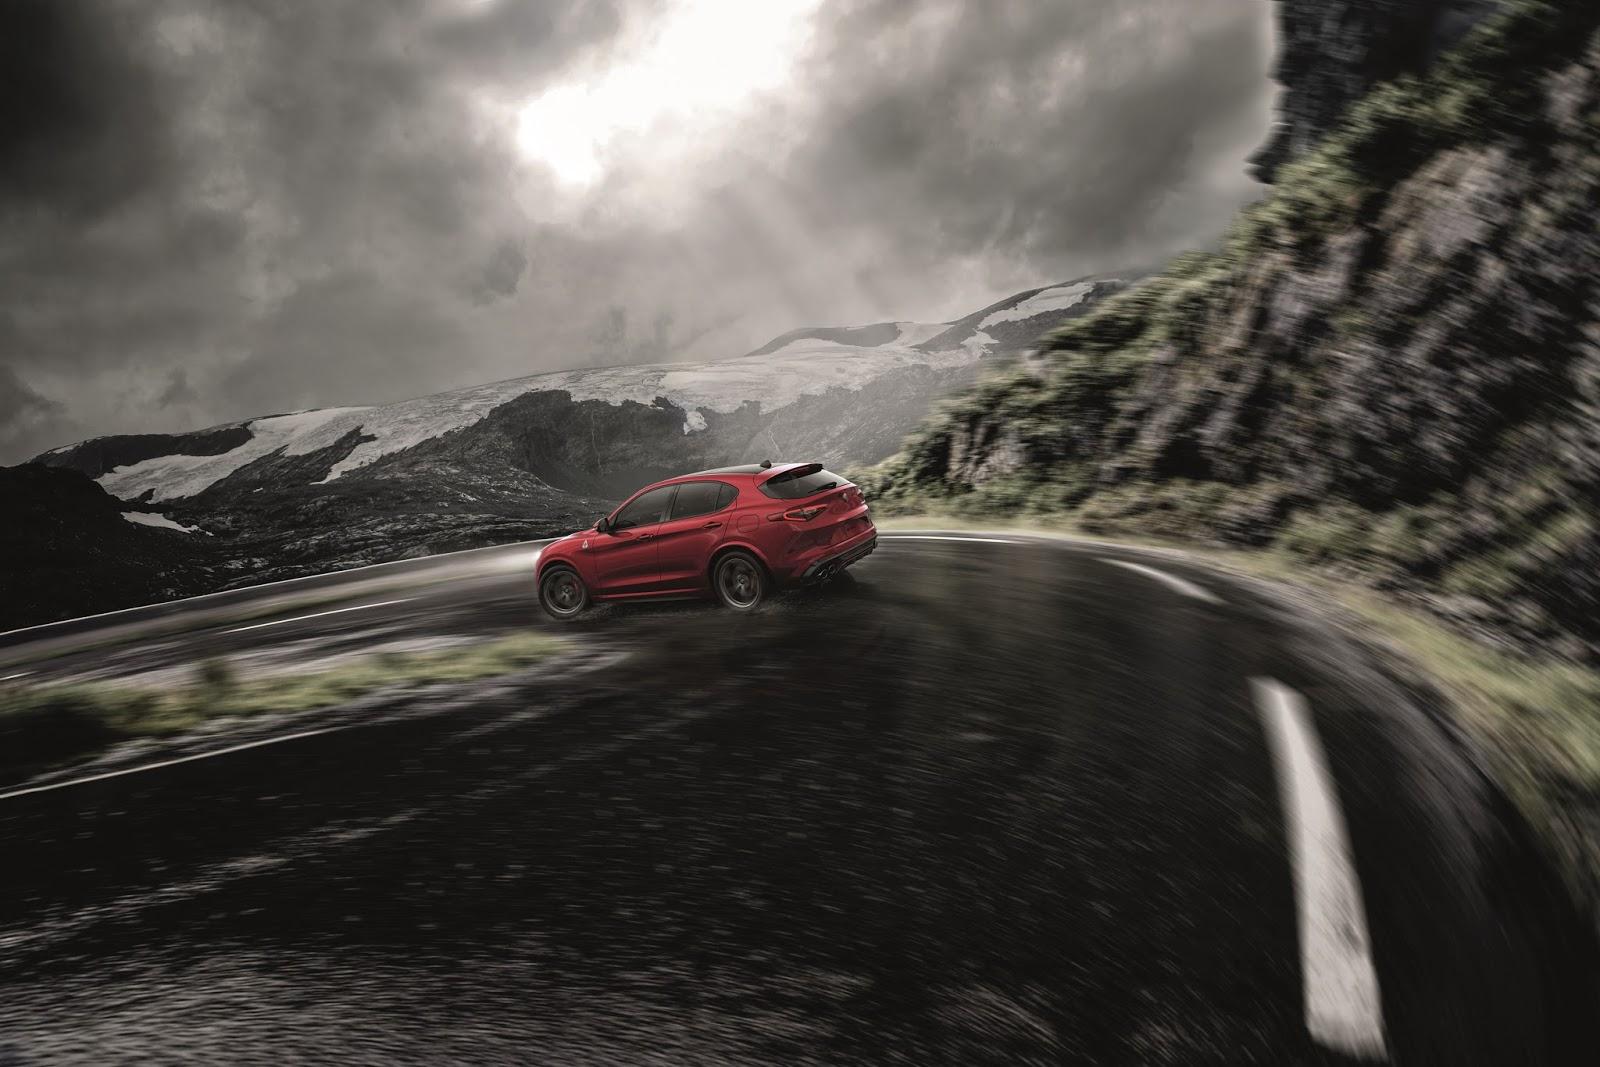 fe14b3ce5d Η εξέλιξή του έγινε στο κέντρο εξέλιξης της Alfa Romeo στη Modena της  Ιταλίας